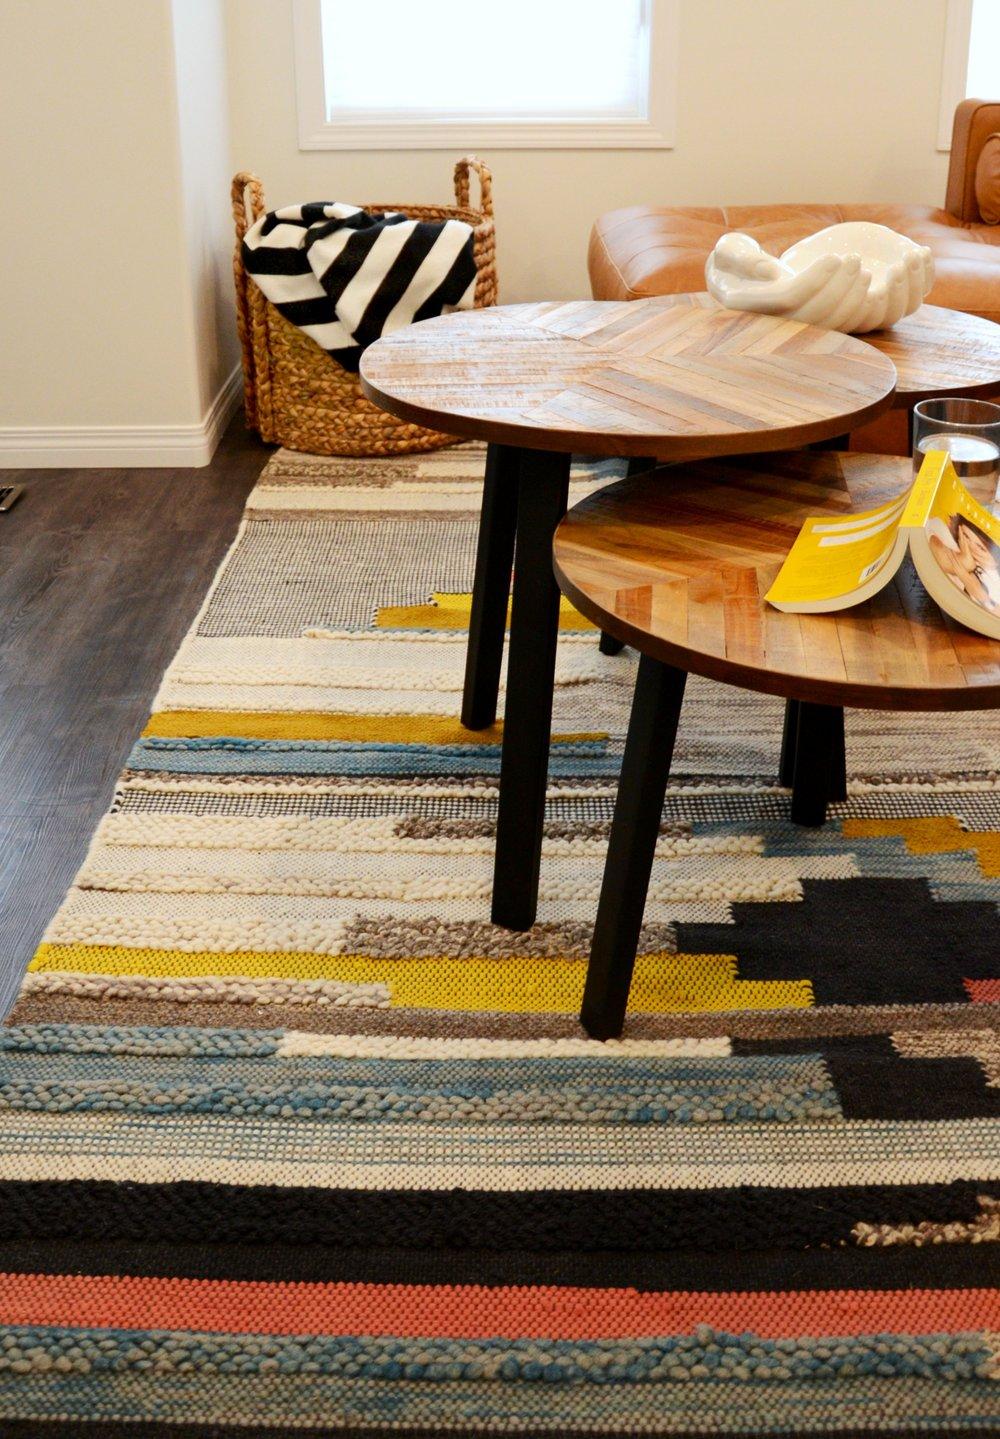 calgary-interior-designer-family-room-coffee-table-5.jpg